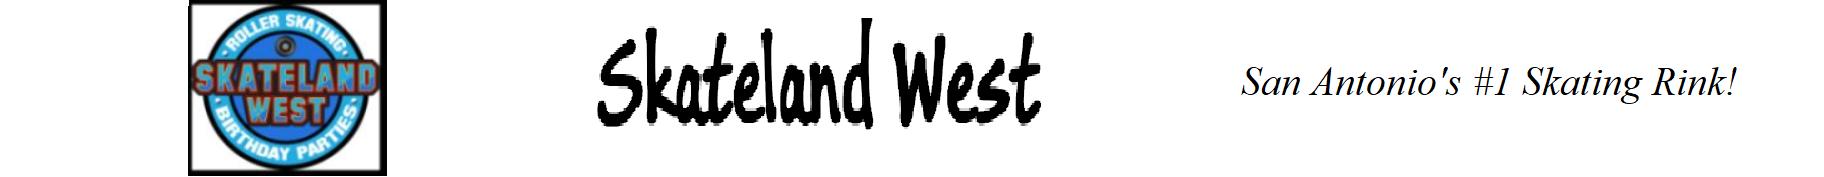 Skateland West